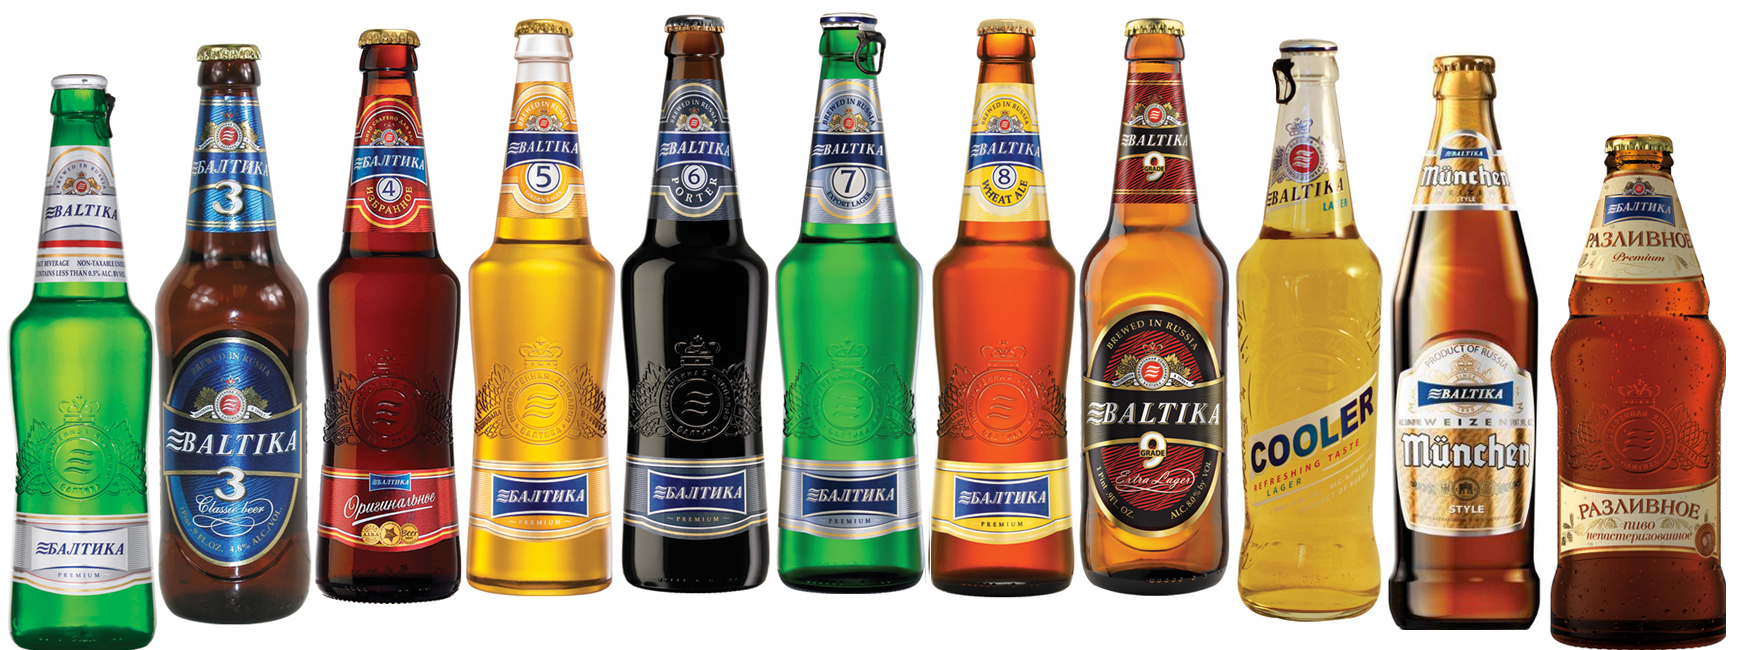 Baltika Beer in Antigua Guatemala – AntiguaDailyPhoto.Com